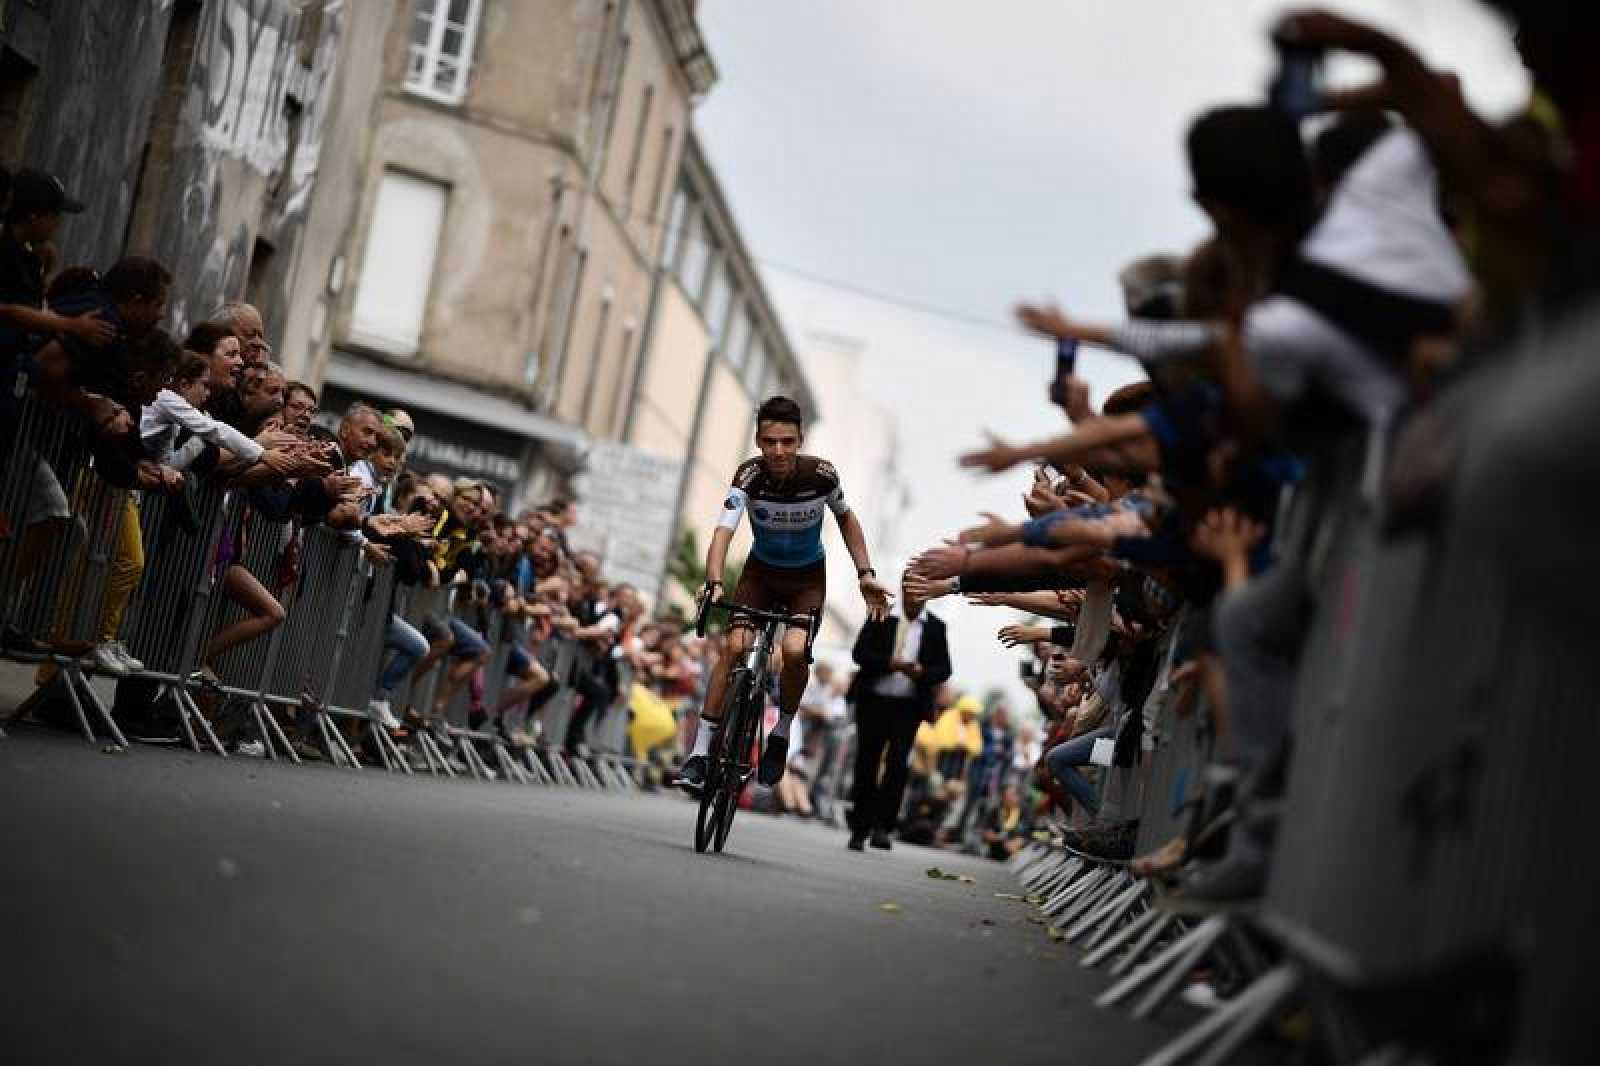 Espectadores franceses reciben al ciclista galo Romain Bardet antes de la presentación del Tour de Francia 2018.